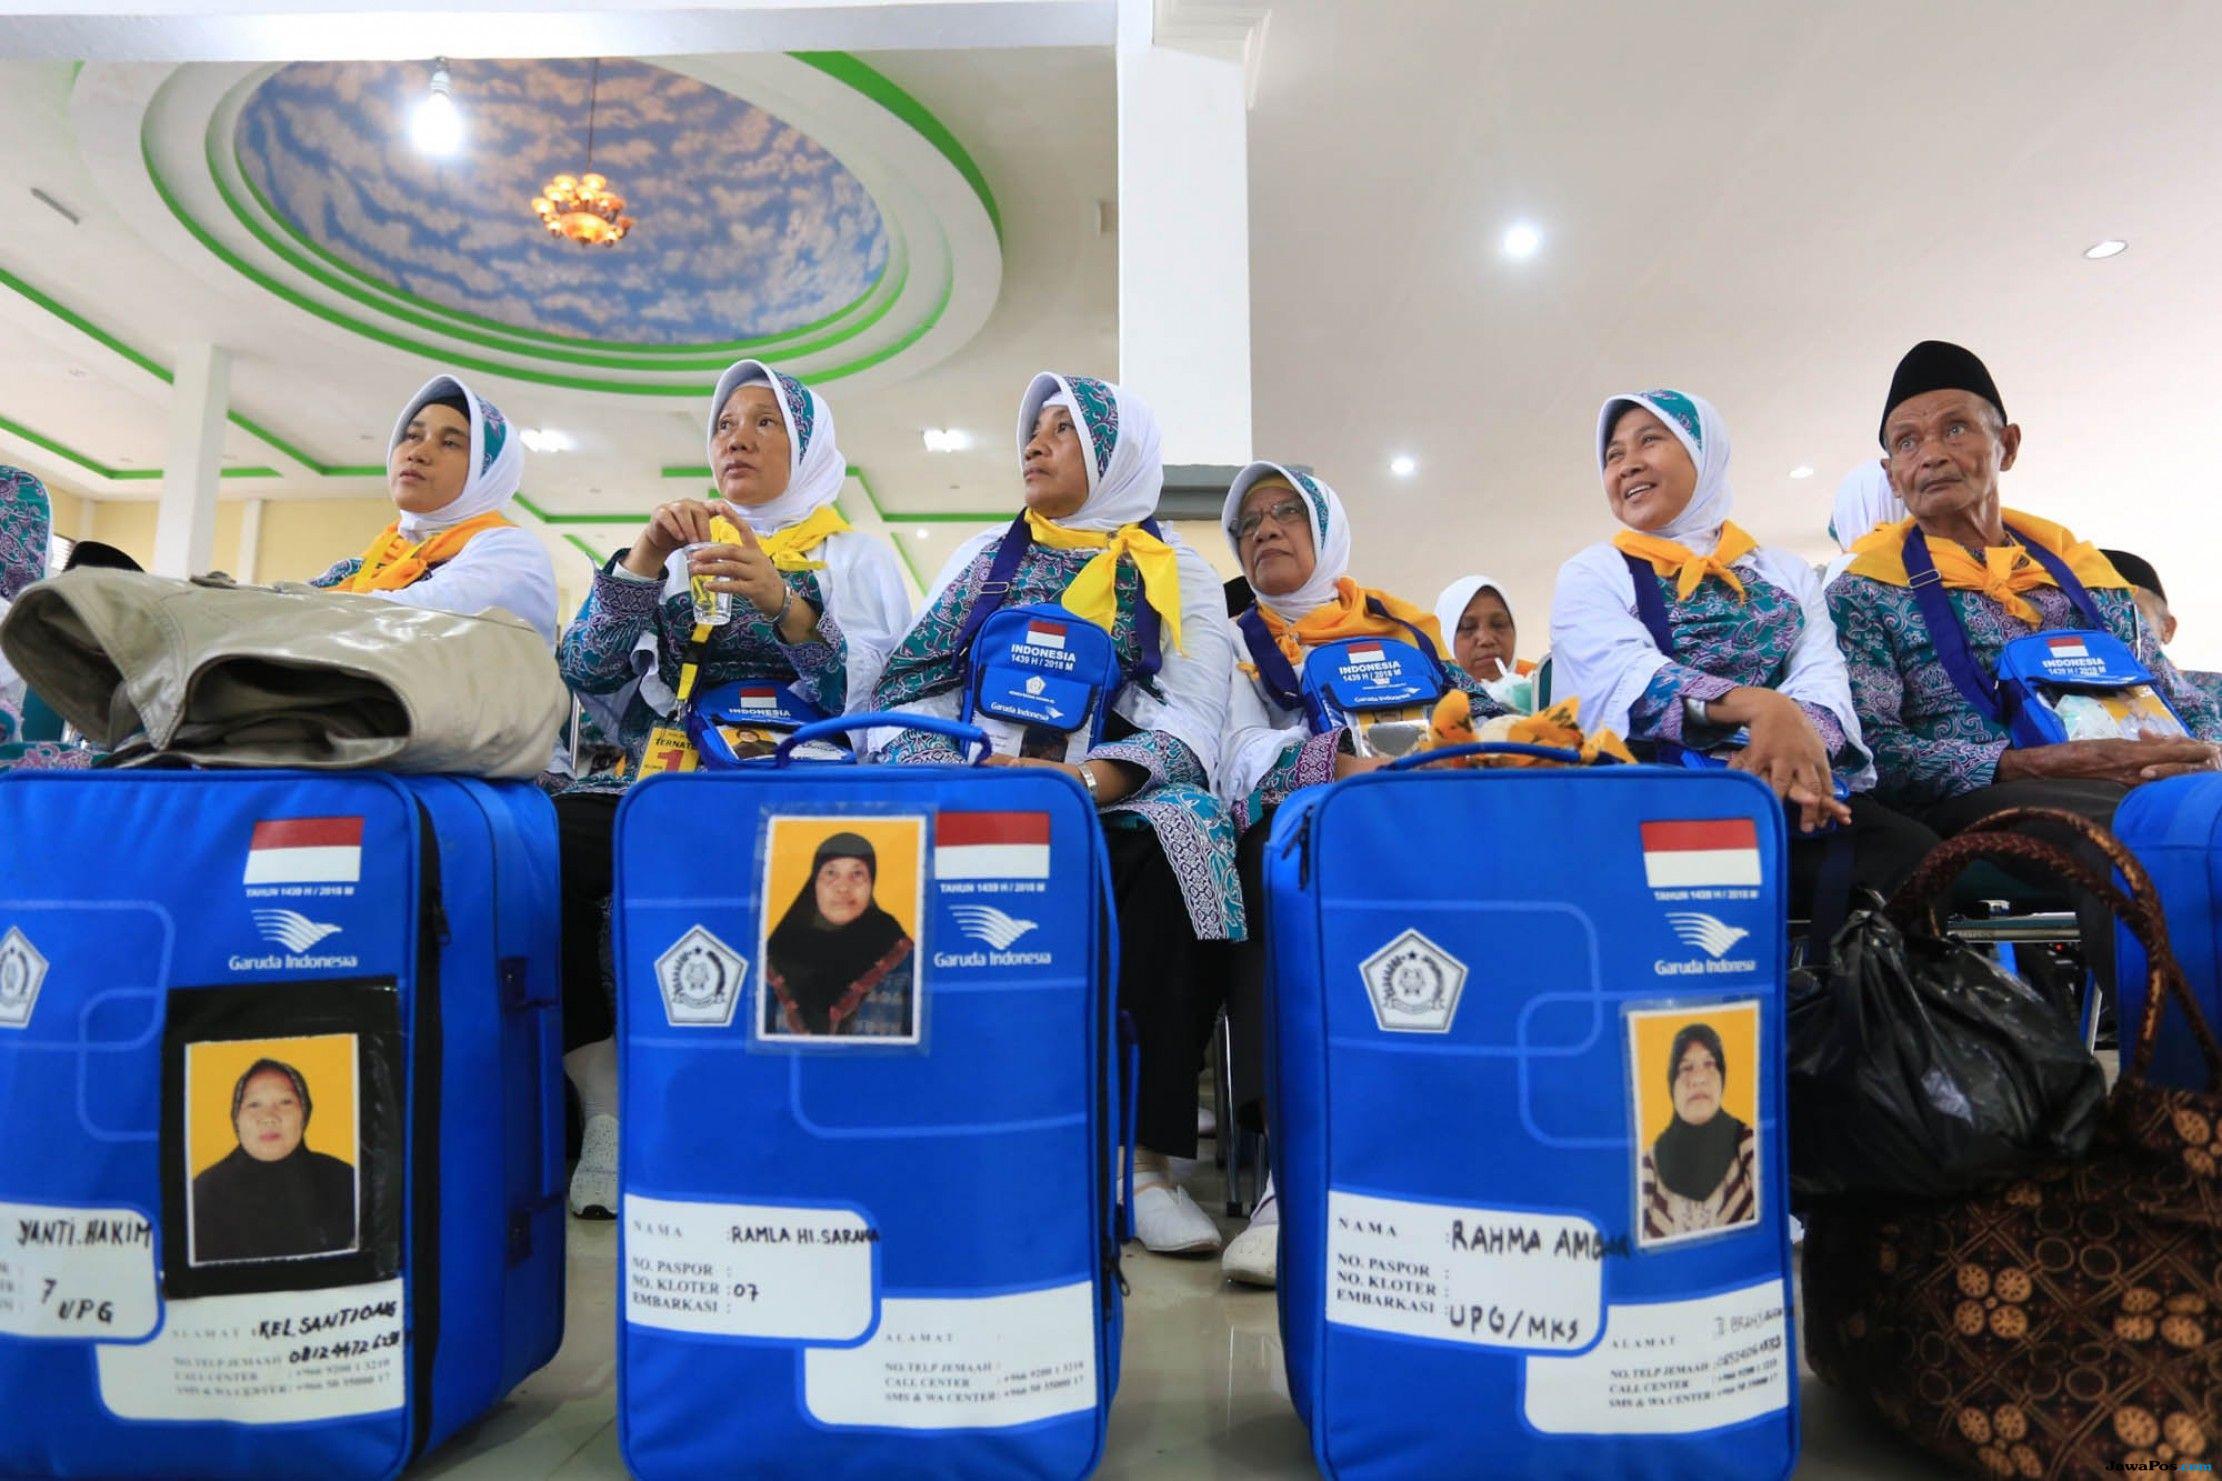 Syarat Pengajuan Visa Haji, Besok CJH Mulai Perekaman Biometrik